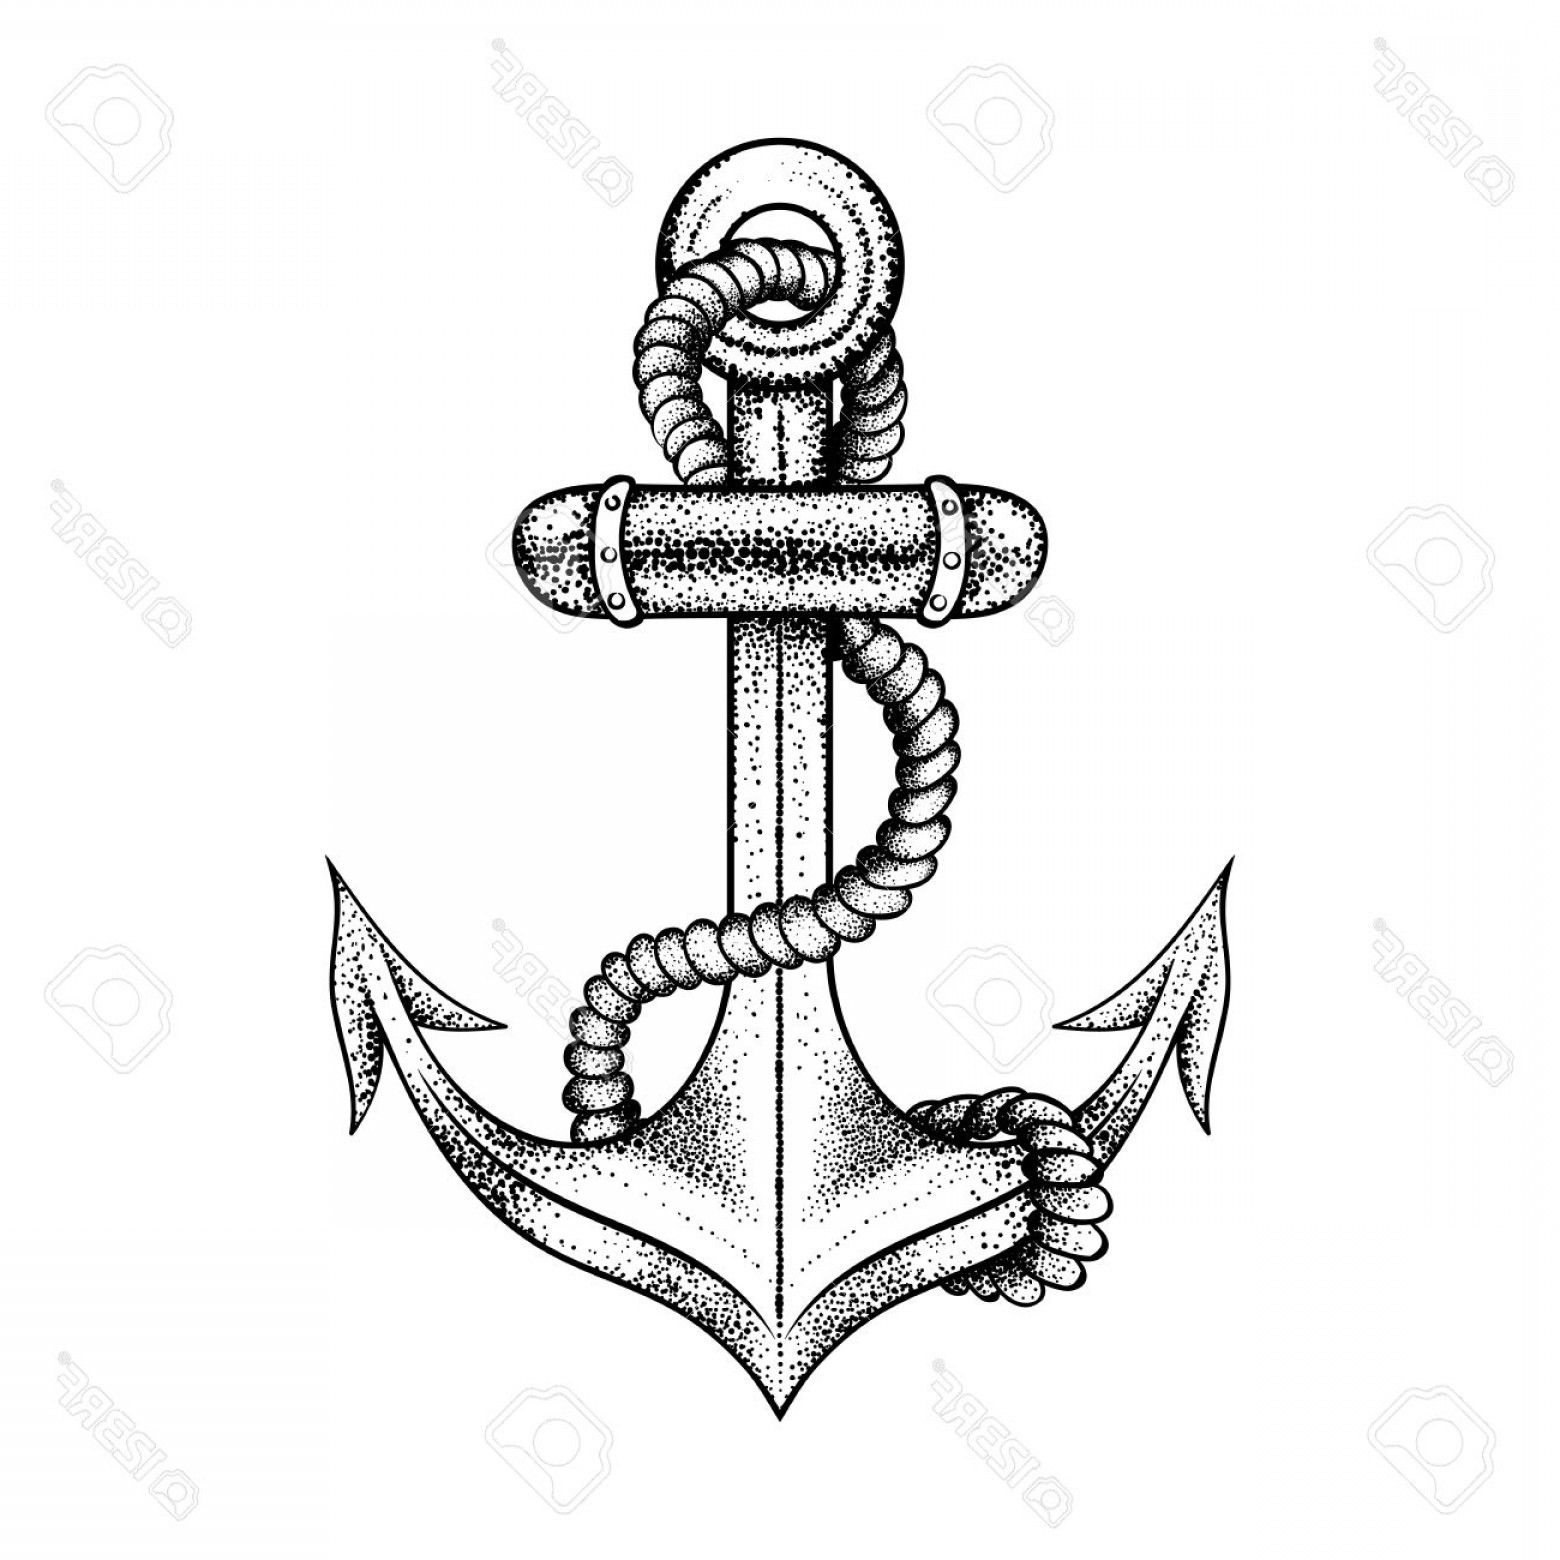 1560x1560 Photostock Vector Hand Drawn Elegant Ship Sea Anchor With Rope